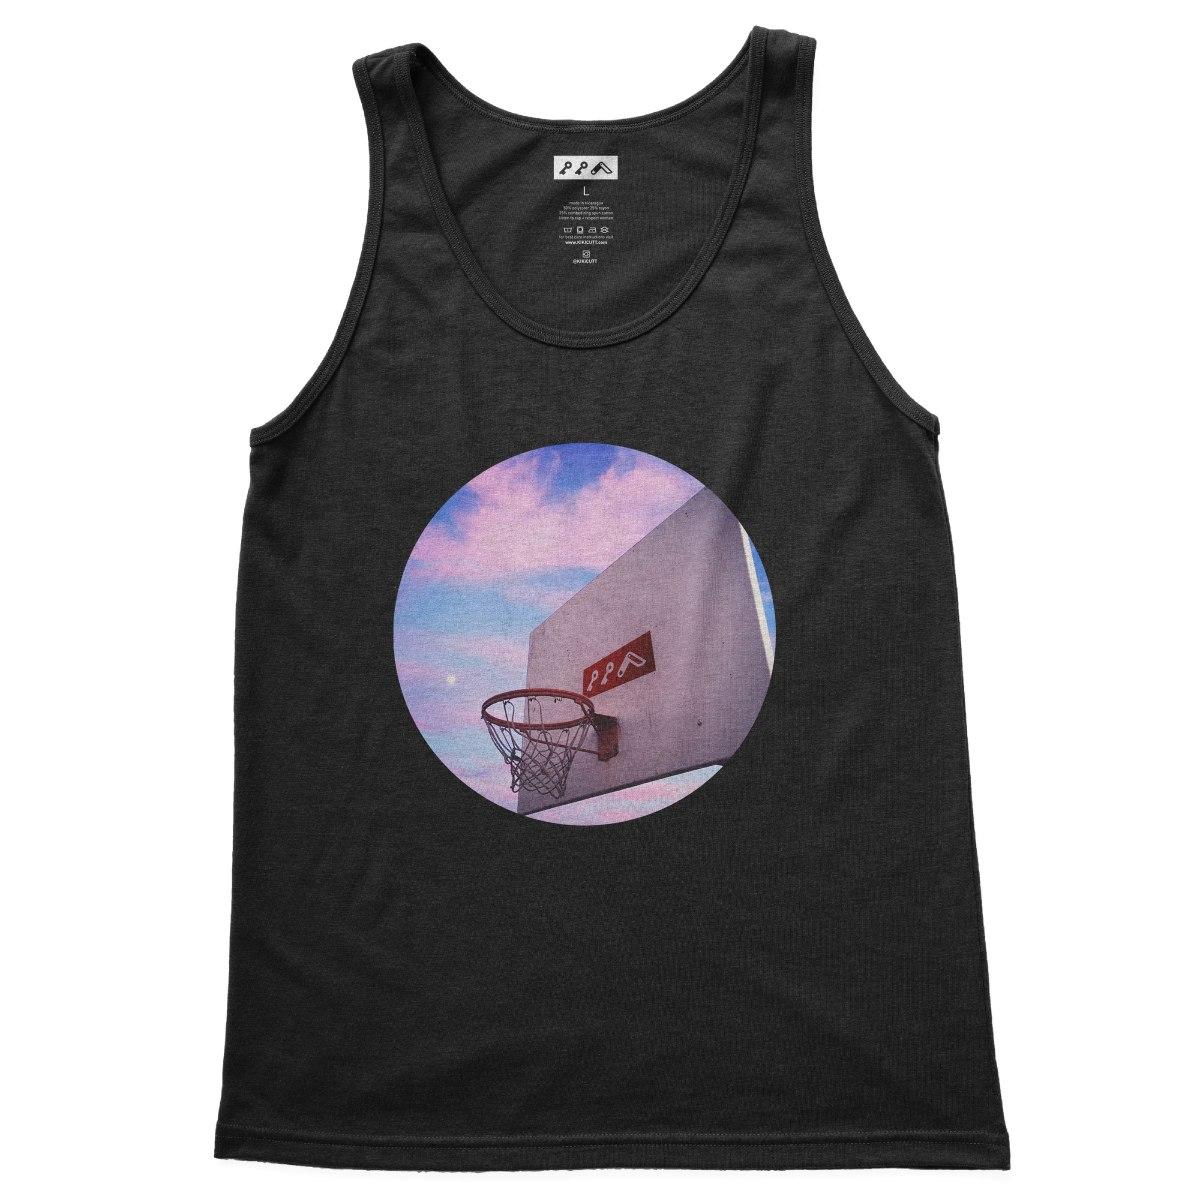 """HOOP DREAMS"" soft basketball tank tops in black tri-blend by kikicutt"